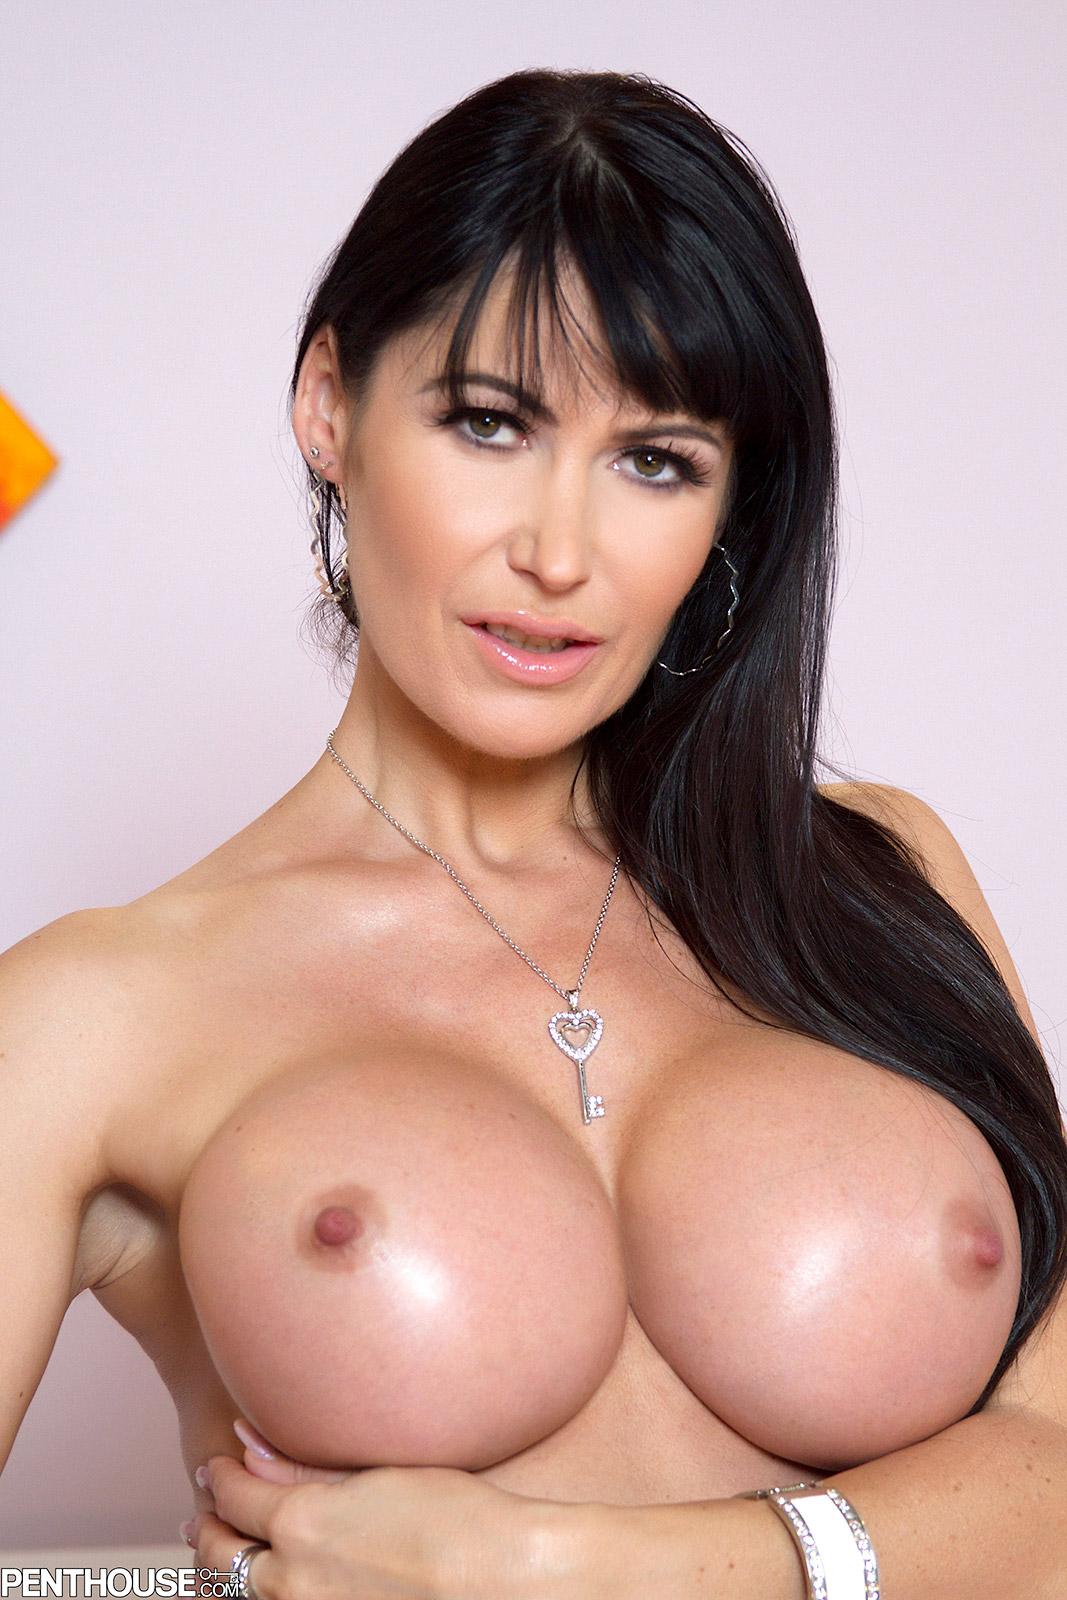 Nikki dream porn